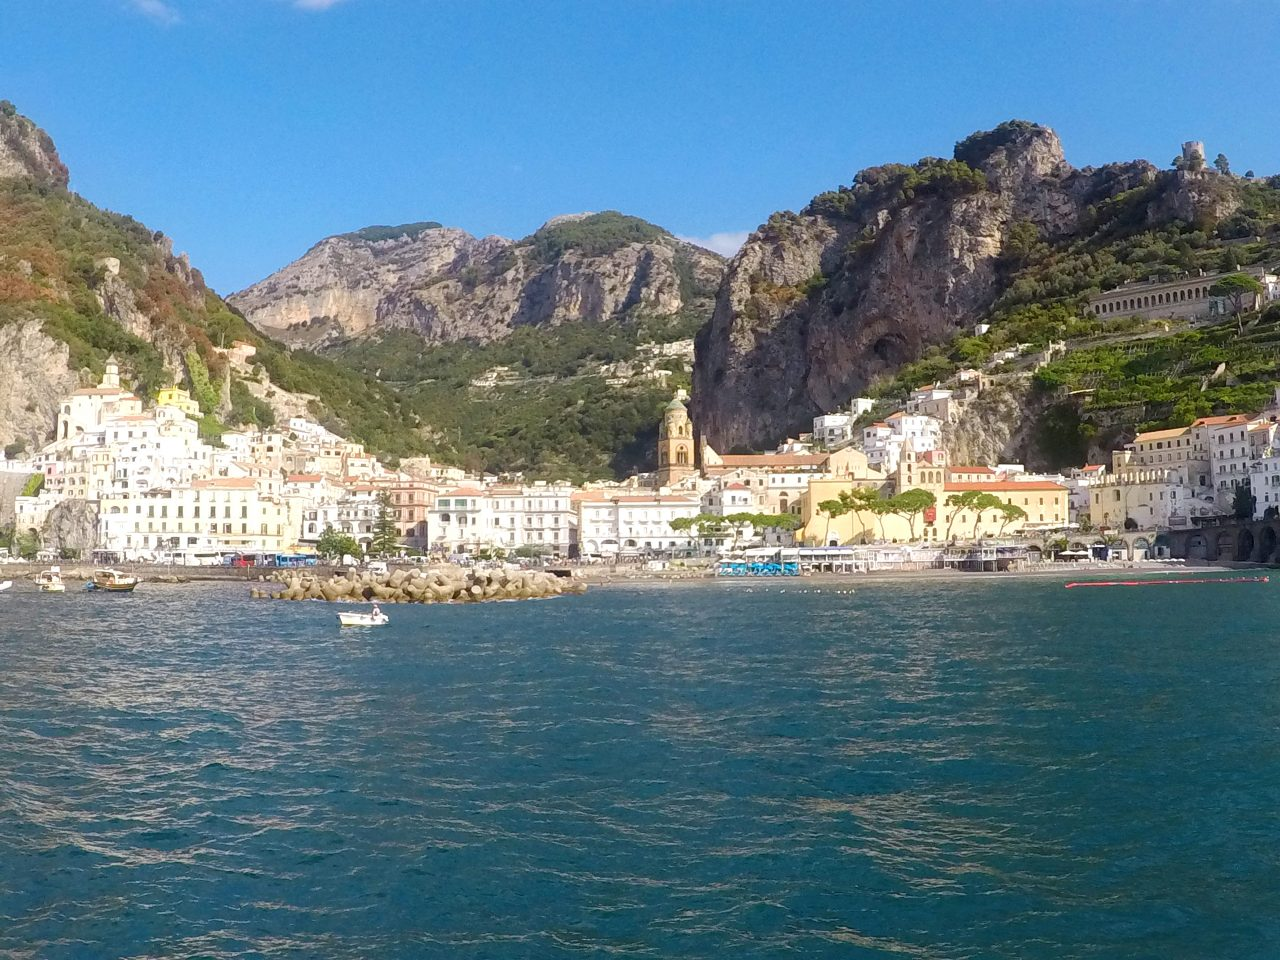 Cannaverde Glamping, Amalfi Coast | The Italian Wanderer